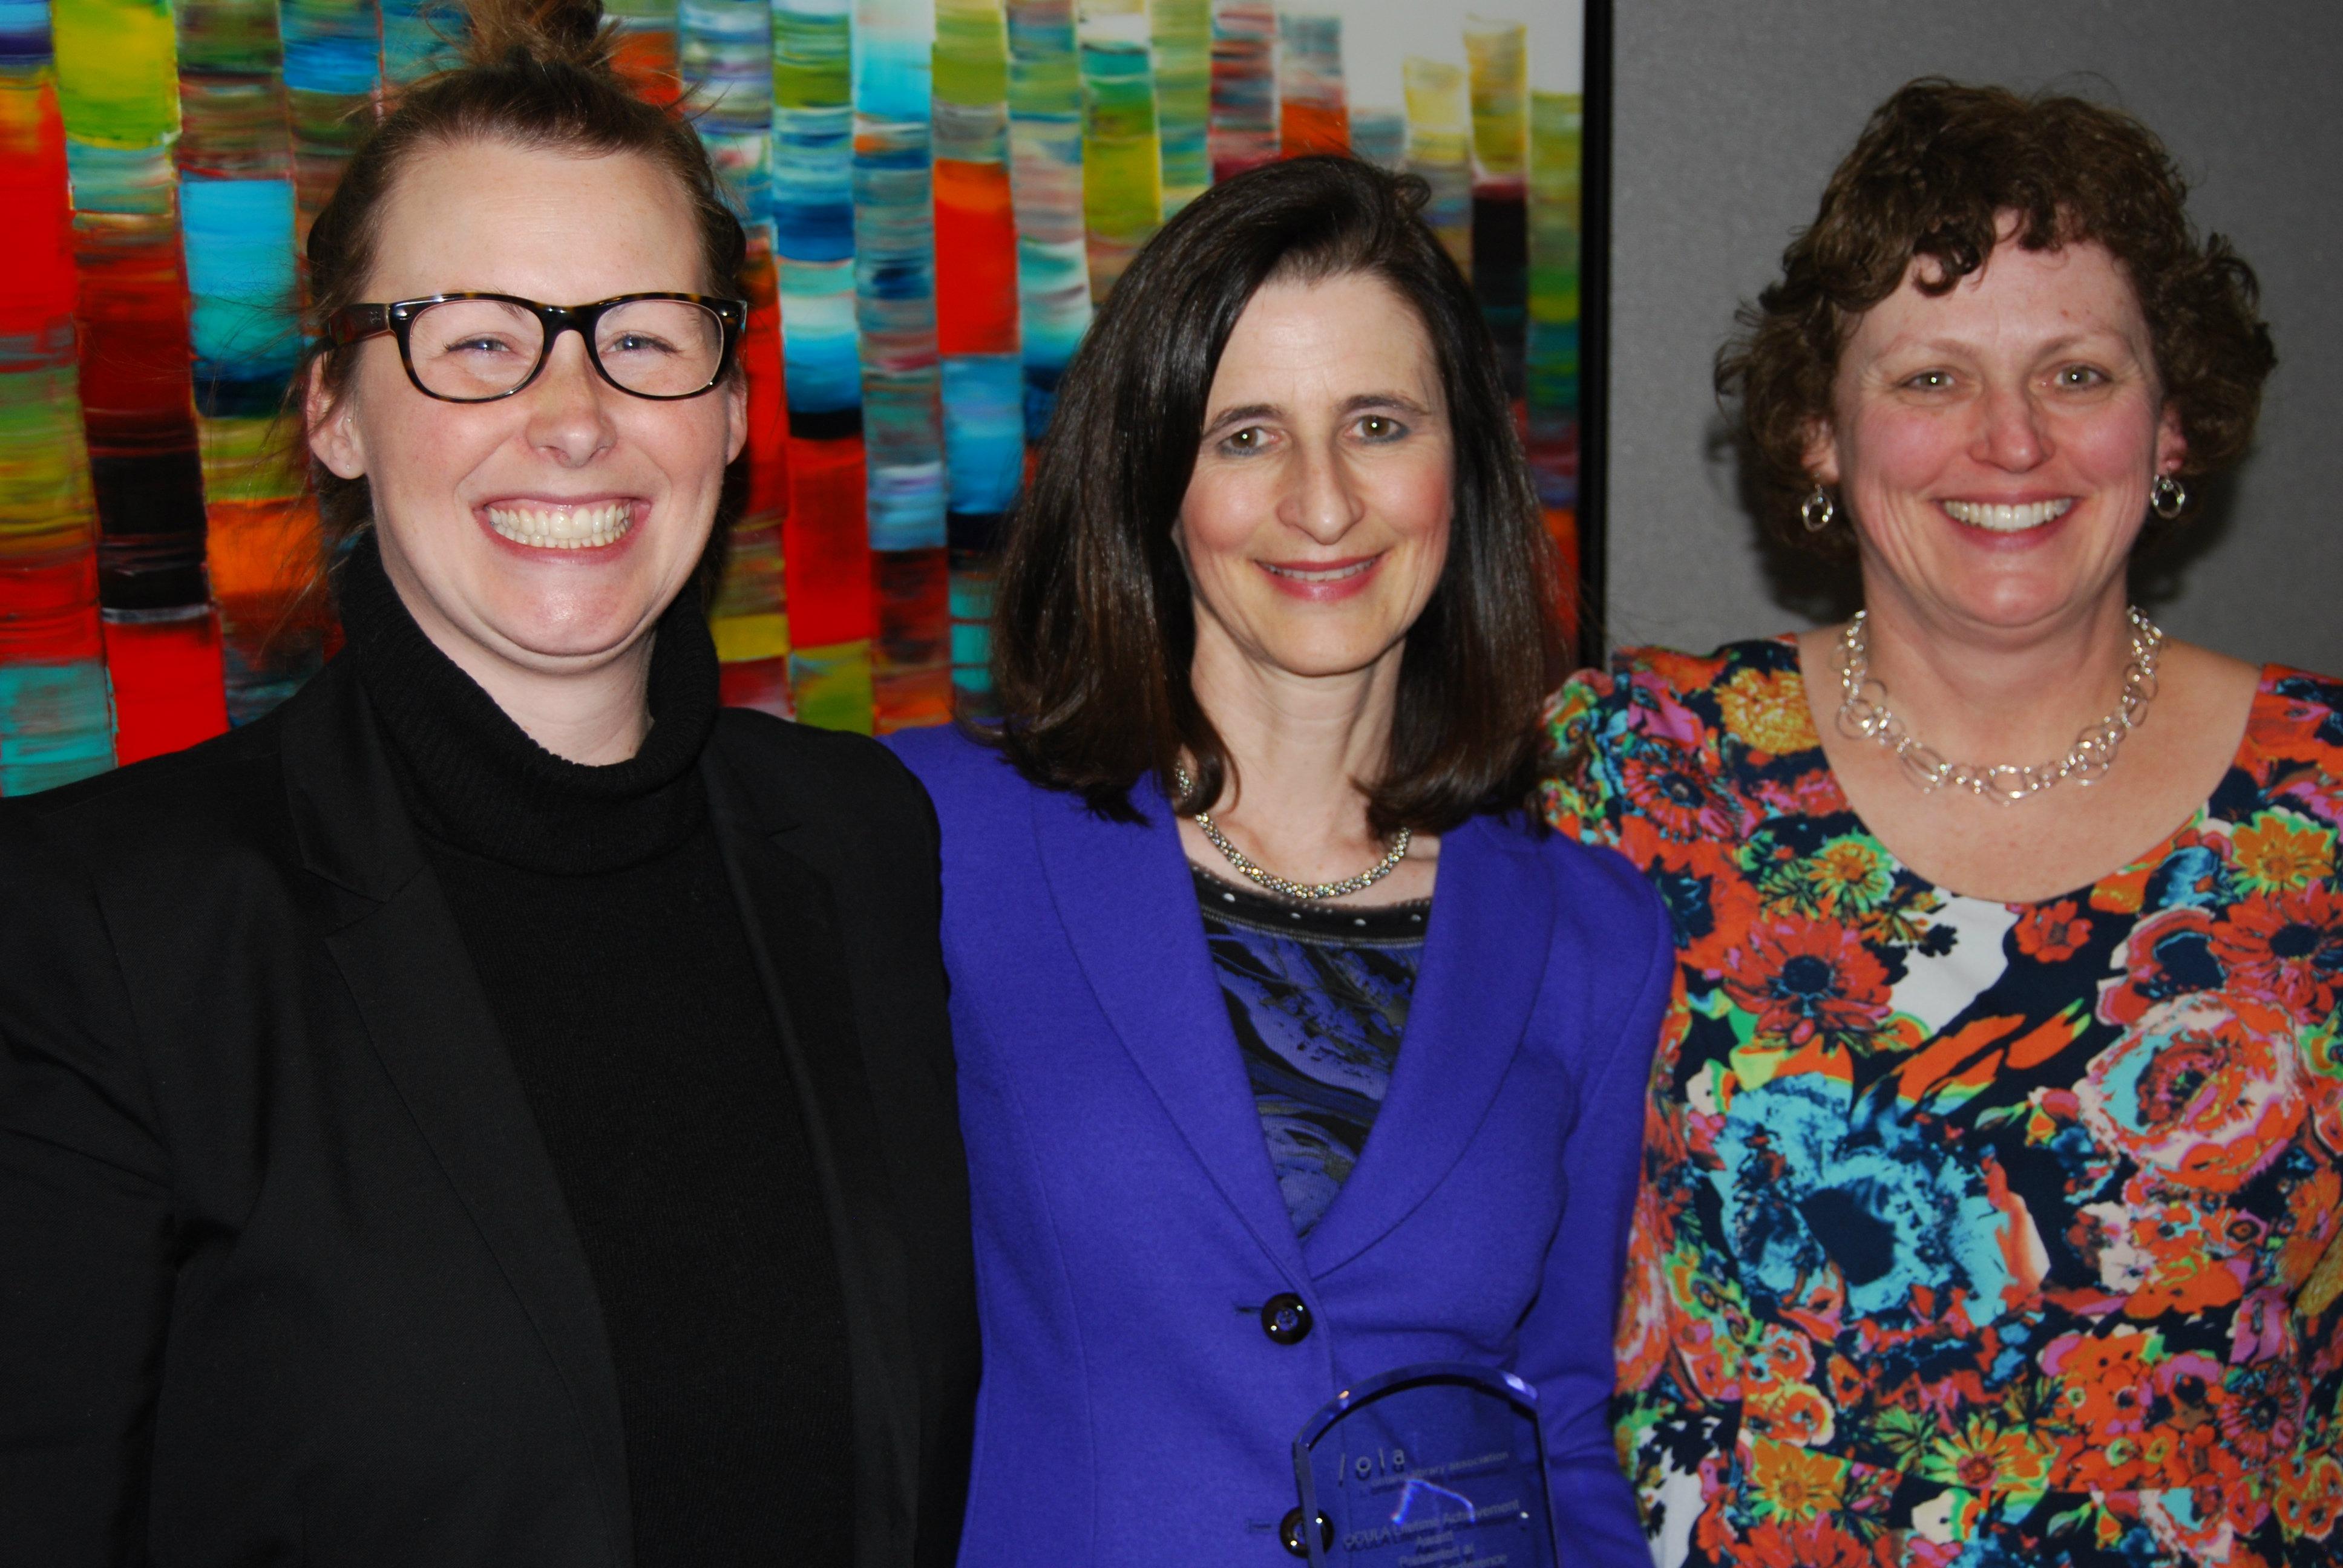 Mary Ann Mavrinac (centre), OCULA's 2014 Lifetime Achievement Award winner, along with nominators Kim Stymest (left) and Lorna E. Rourke (right) at the 2014 OCULA AGM.